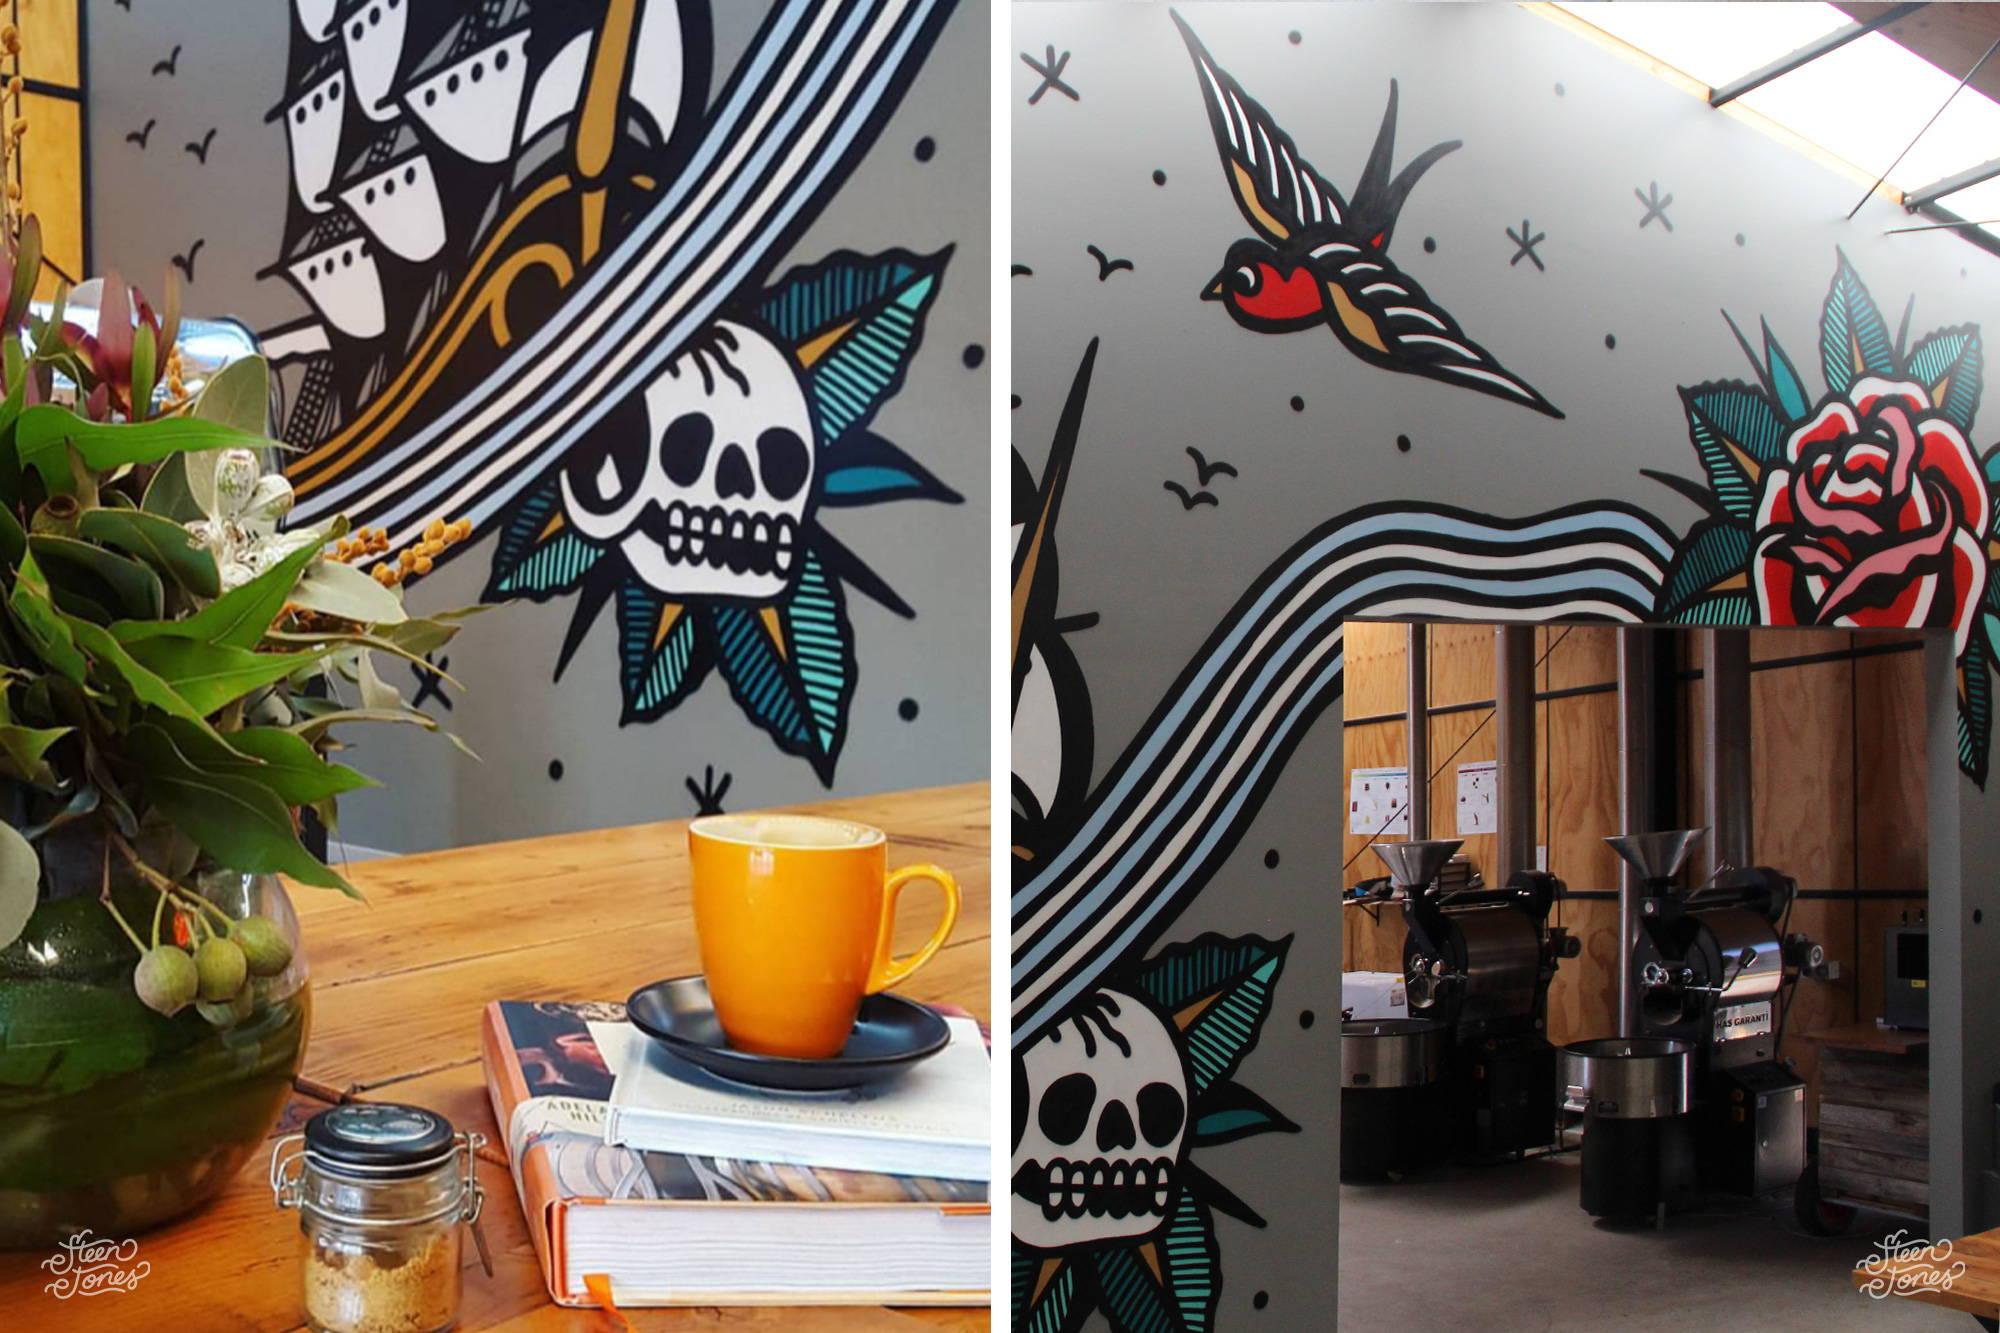 Steen Jones tattoo street artist Australia mural Little Rebel Coffee flowers melbourne